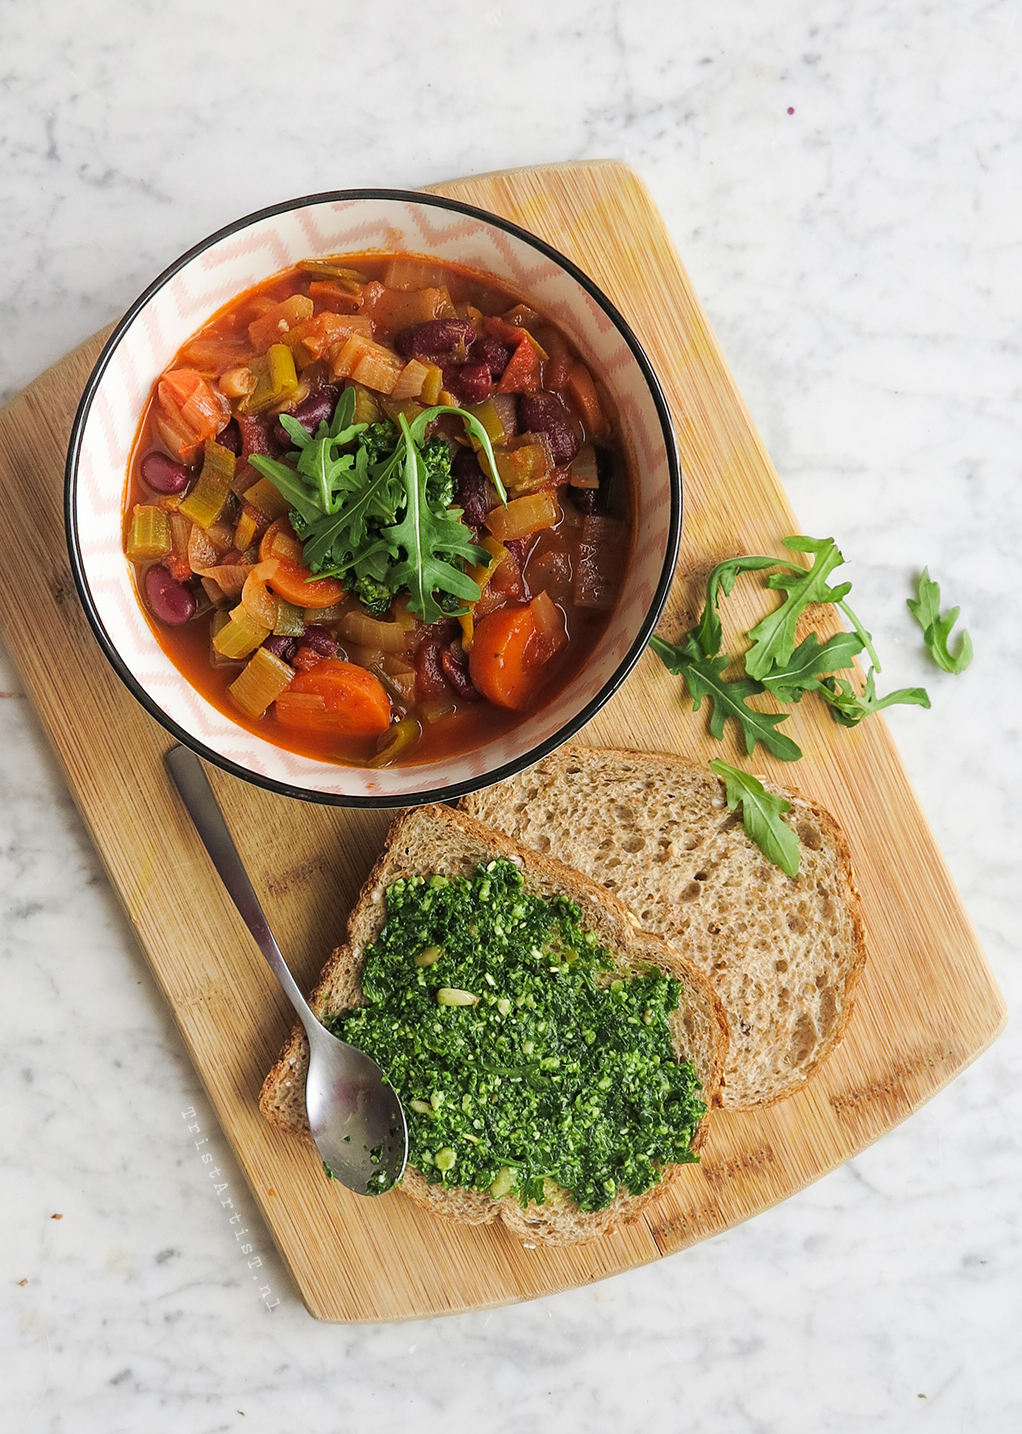 Vegan Friday – Vegetable soup with arugula pesto